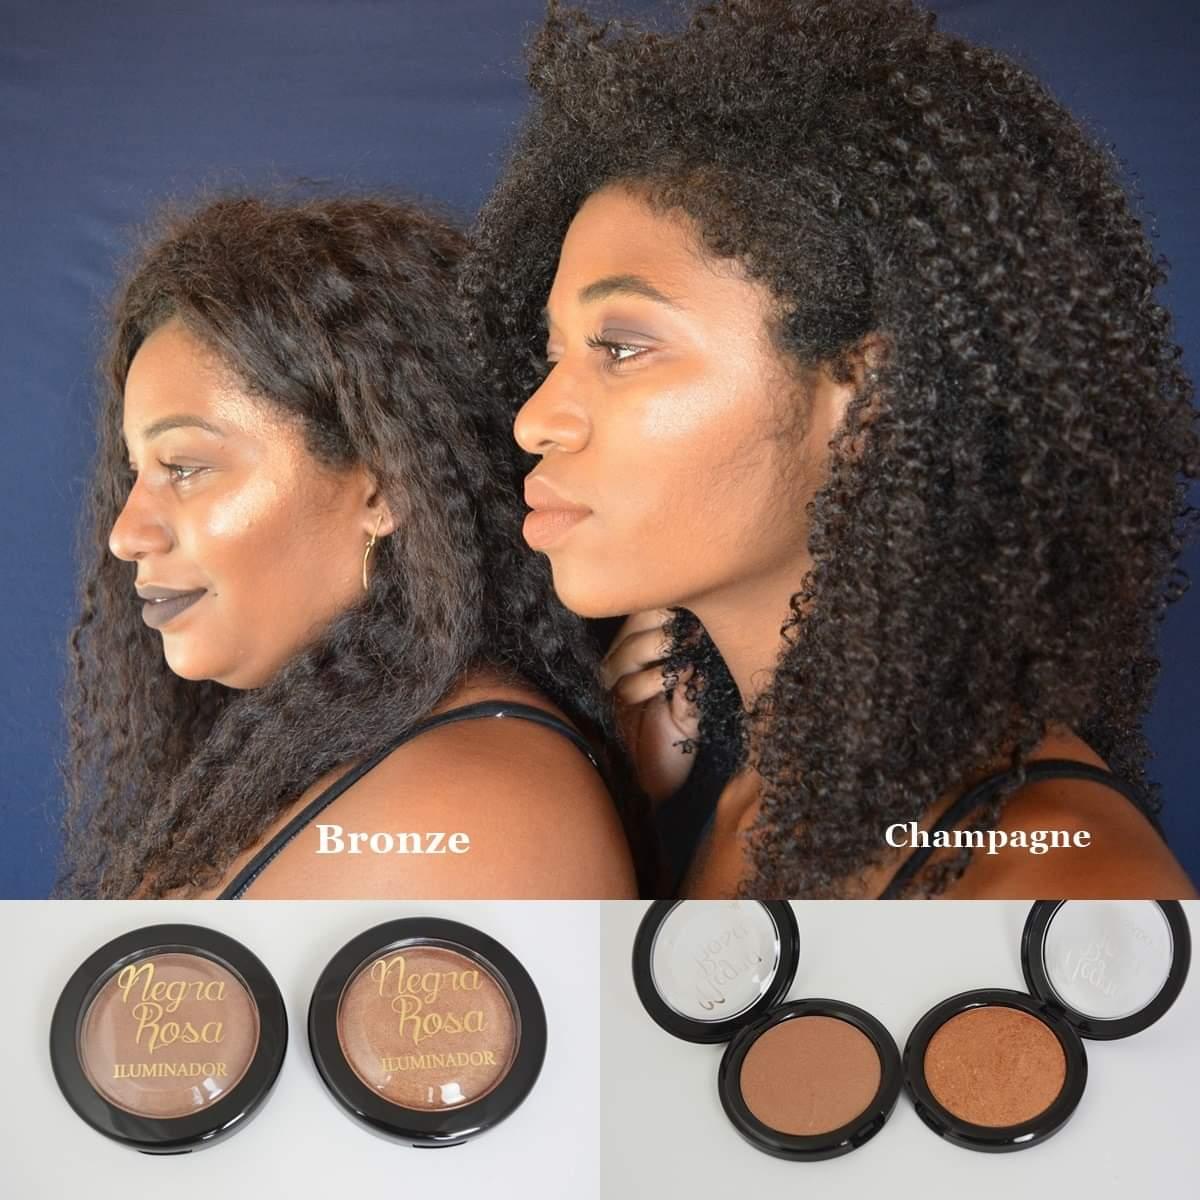 Iluminador Bronze - Negra Rosa